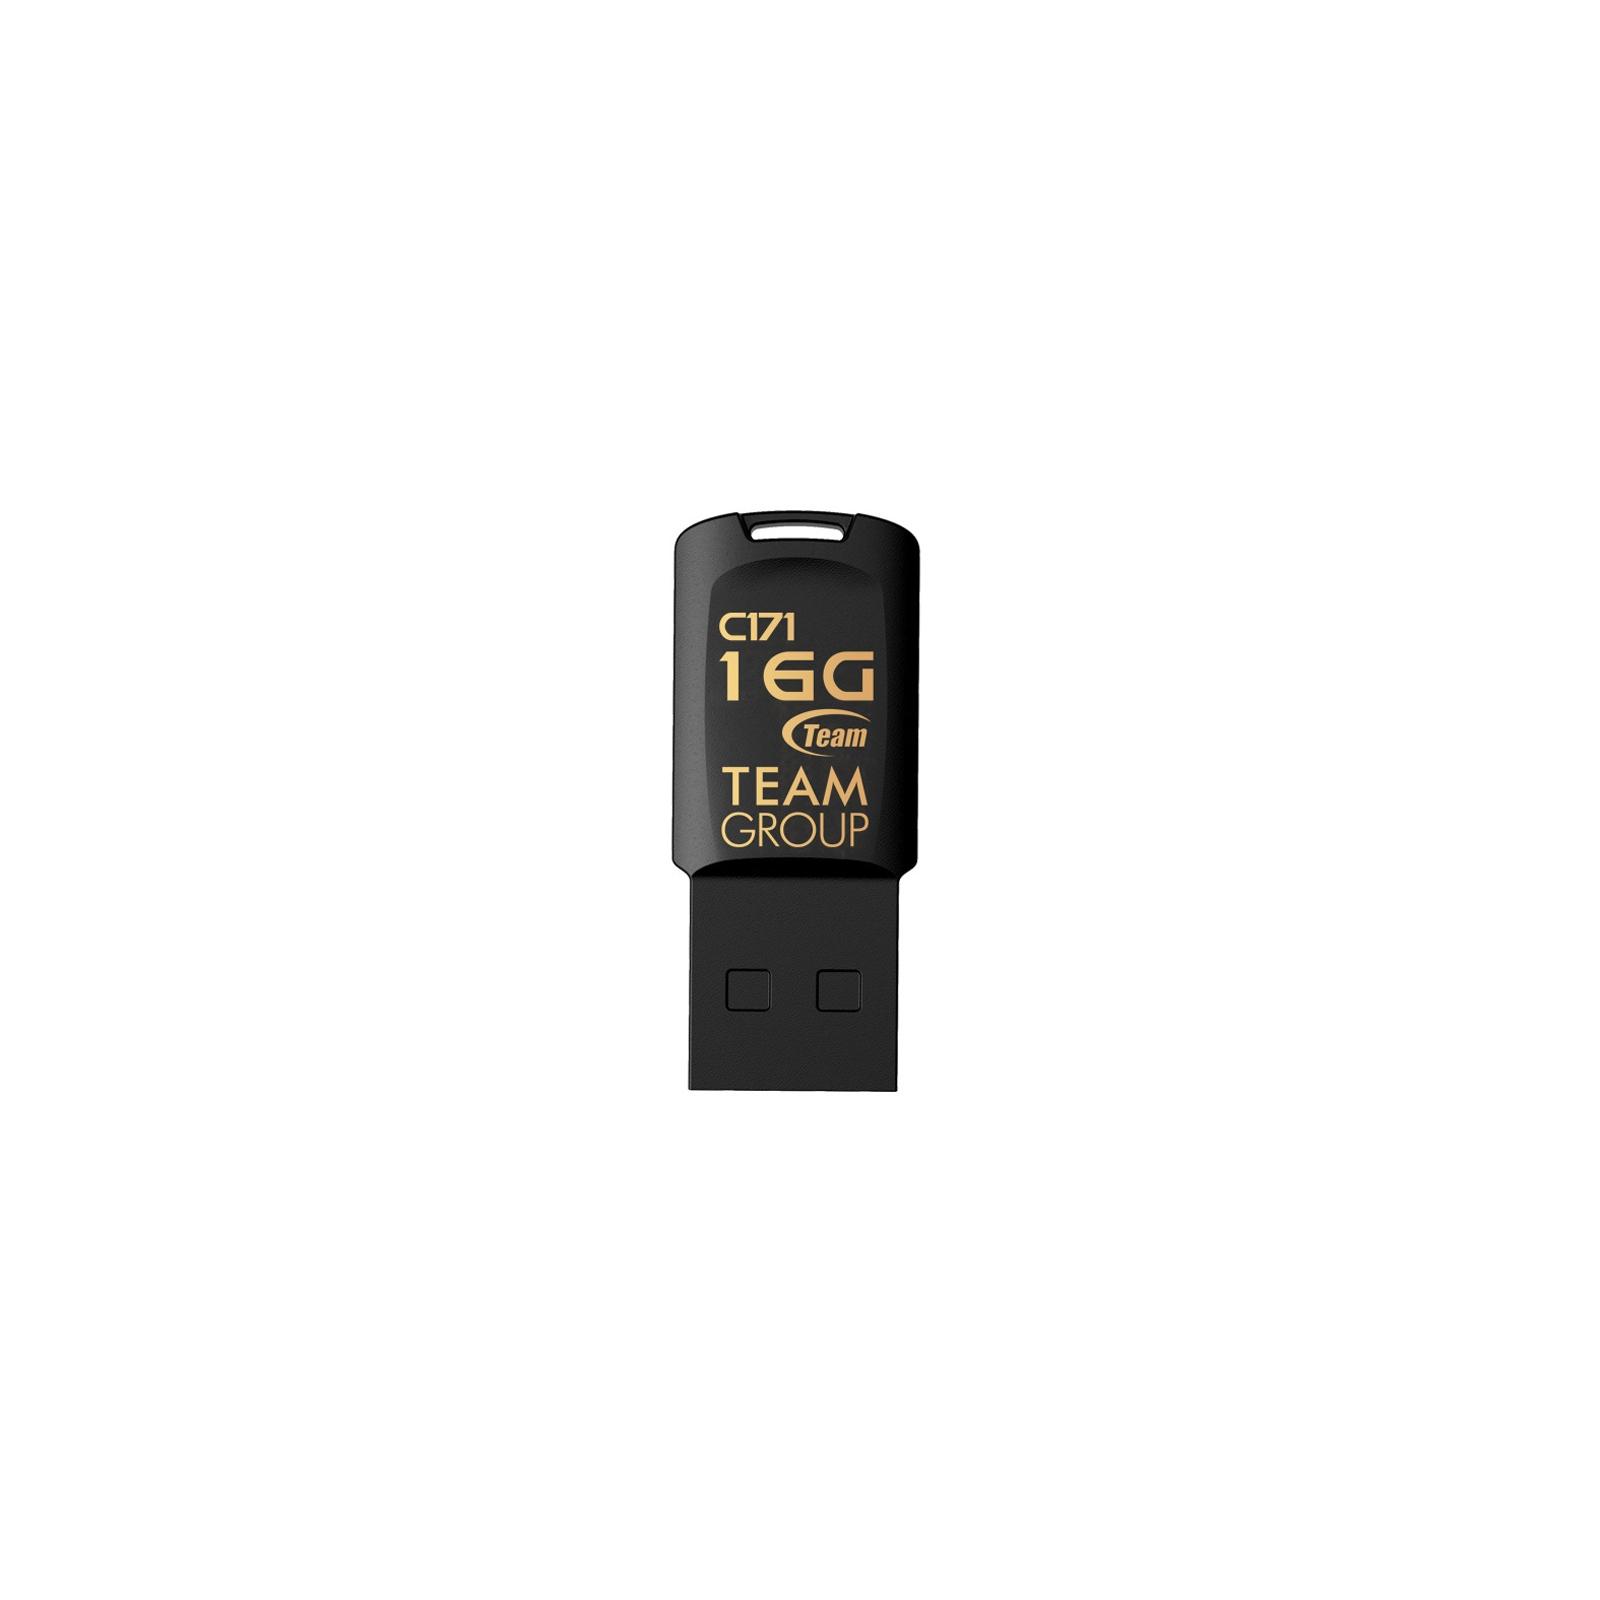 USB флеш накопитель Team 32GB C171 Black USB 2.0 (TC17132GB01)